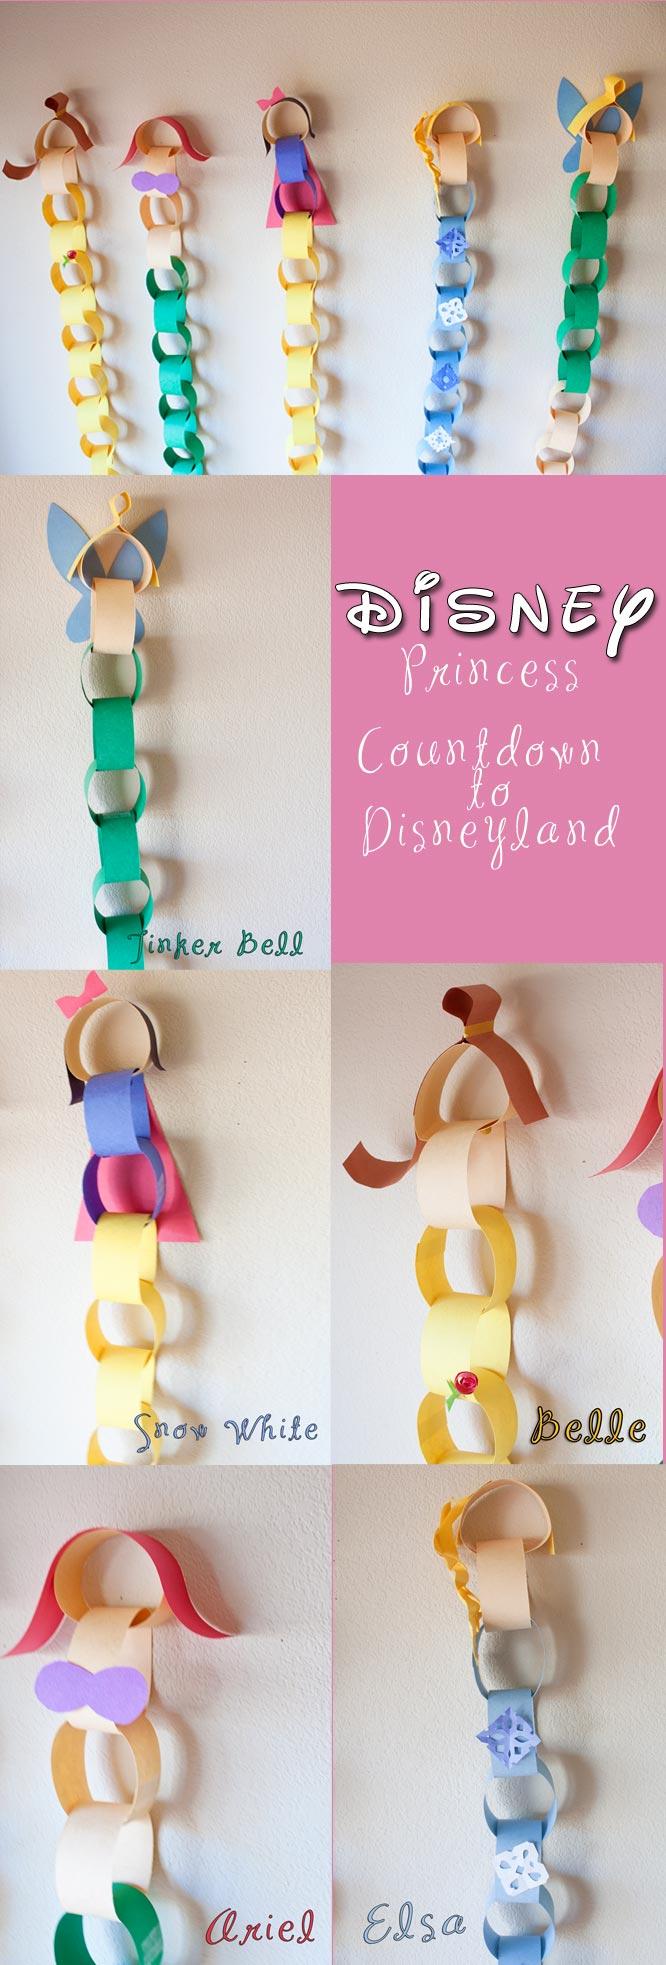 Disney Princess Countdown chain. Great kids craft for Disneyland trips